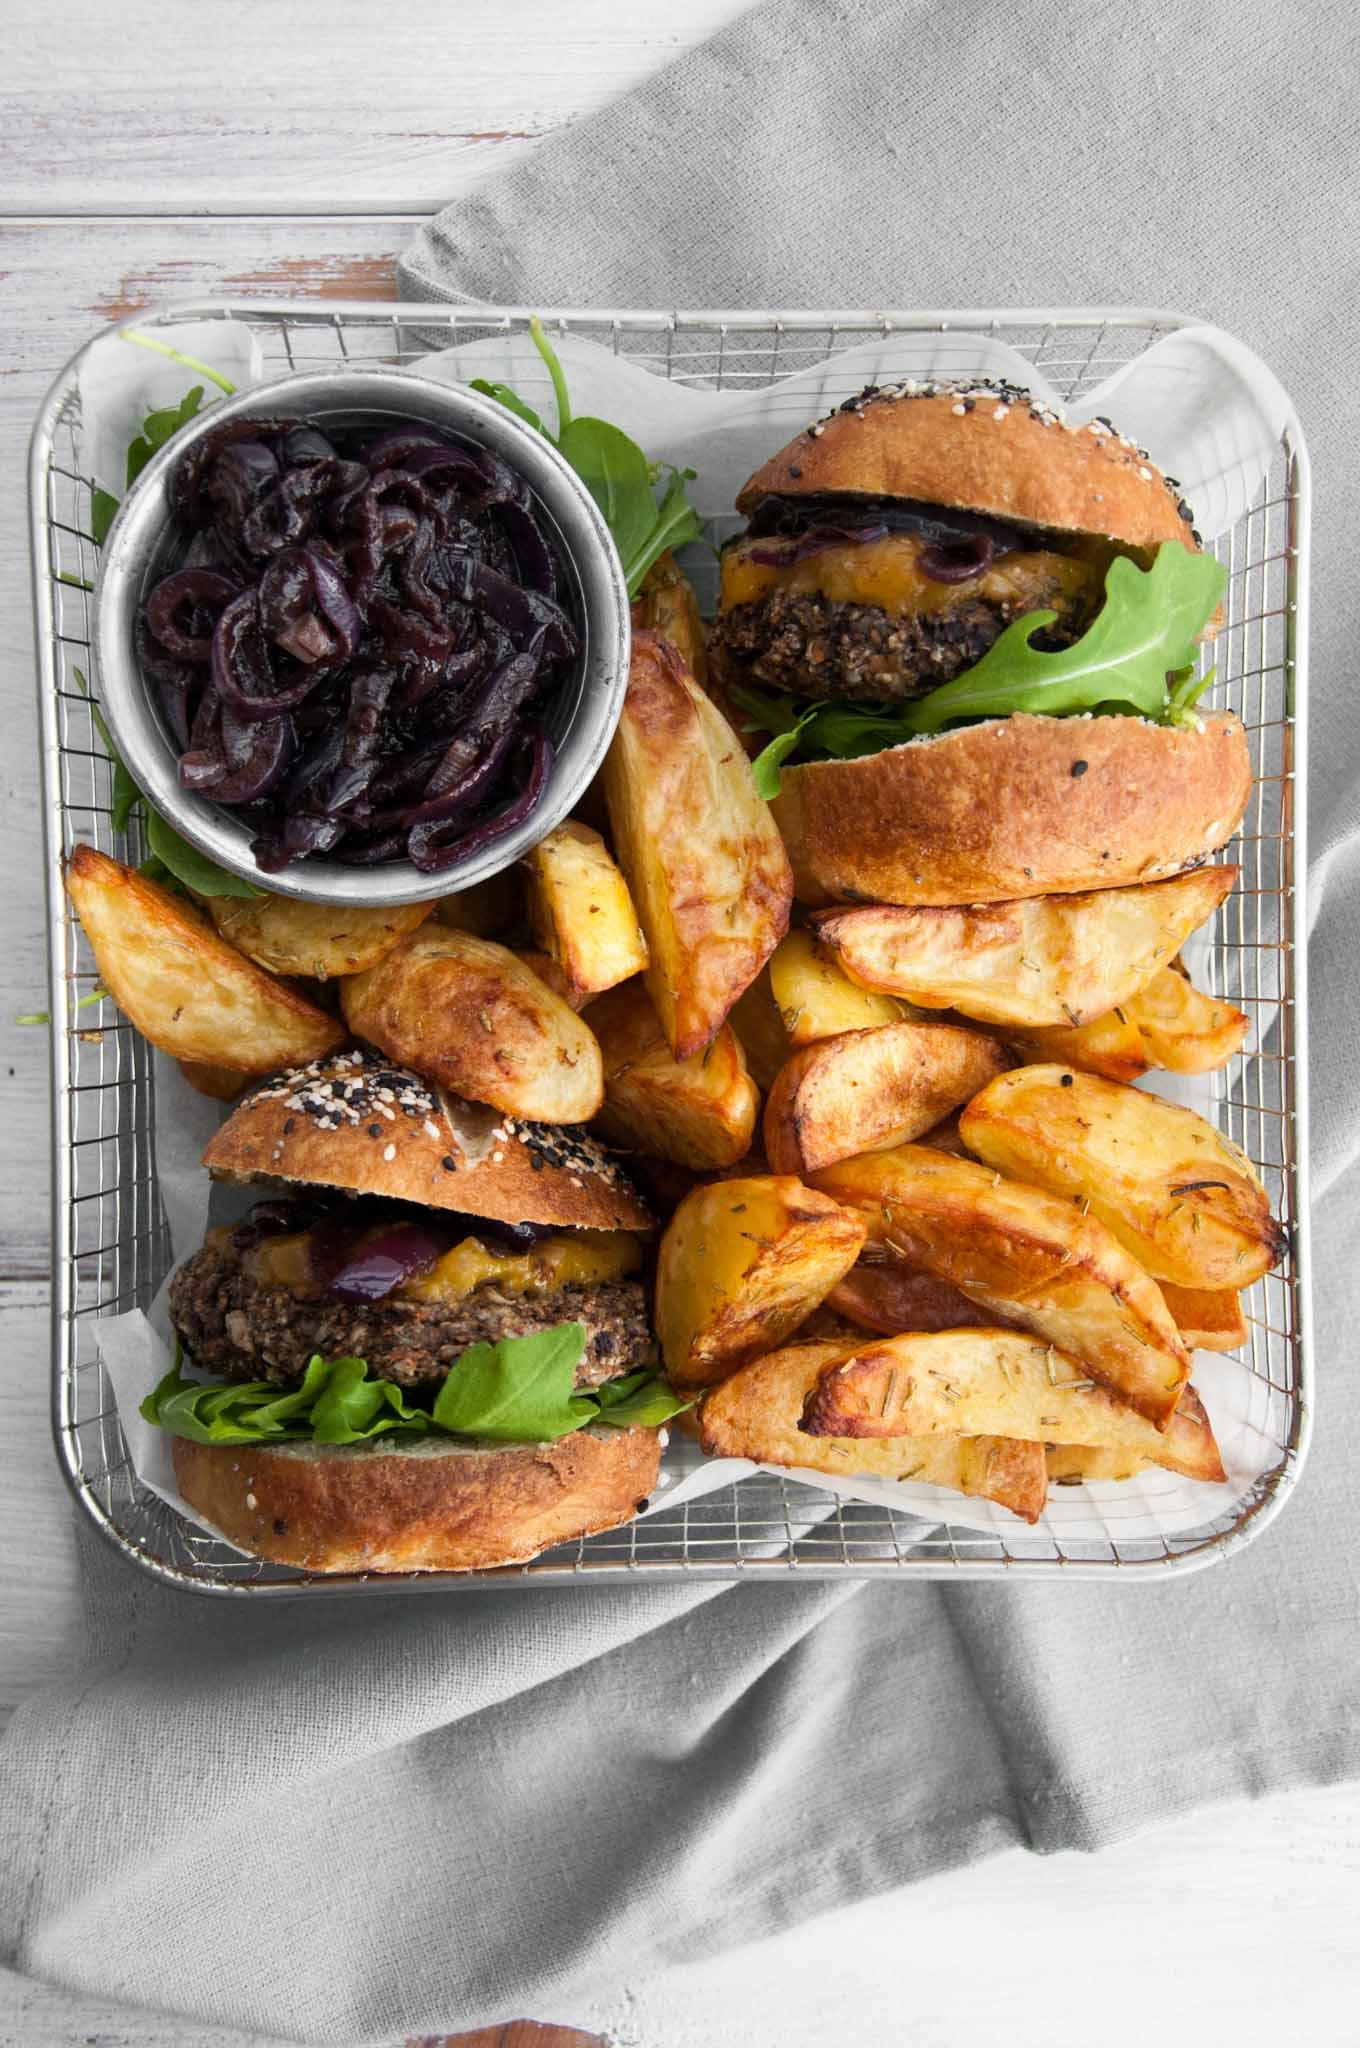 Vegan Mushroom Burger with Wedges